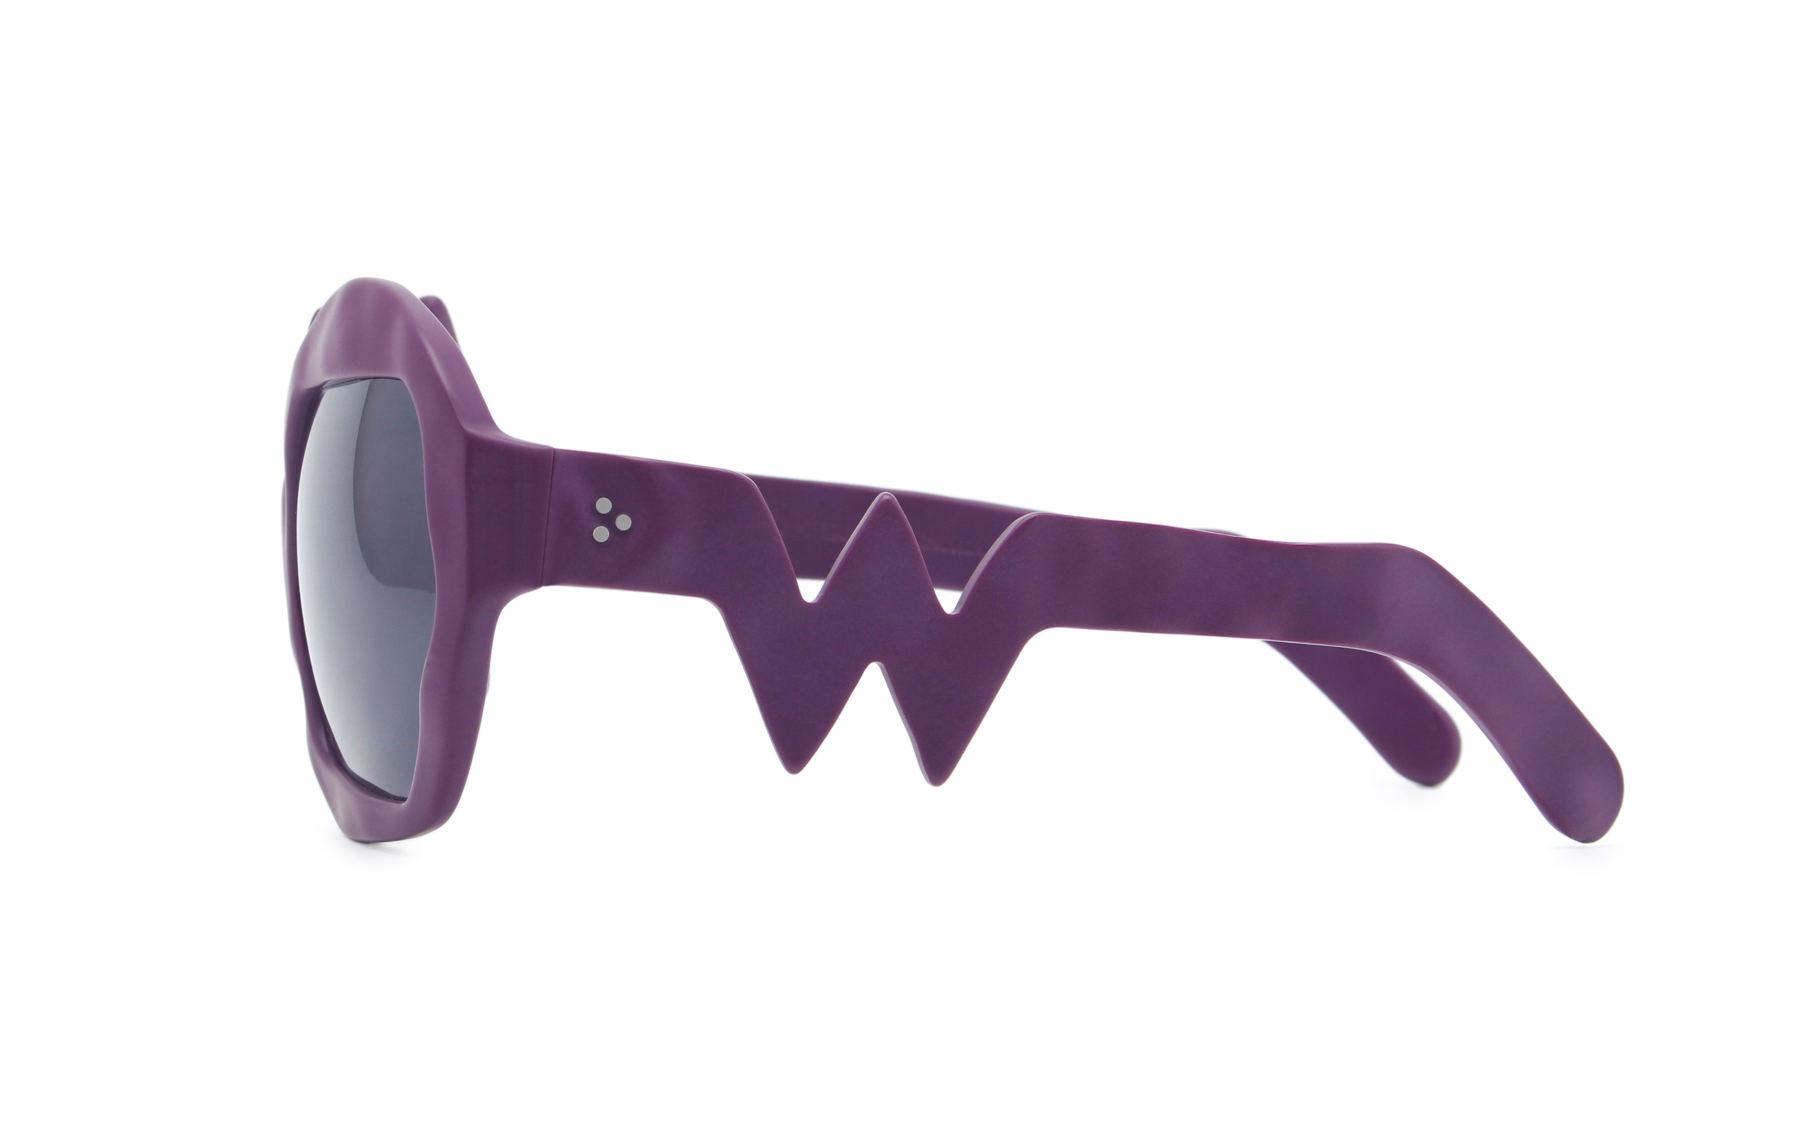 FAKBYFAK x Walter Van Beirendonck  Lightning Sunglasses. Purple Code: FBF-09-11-03